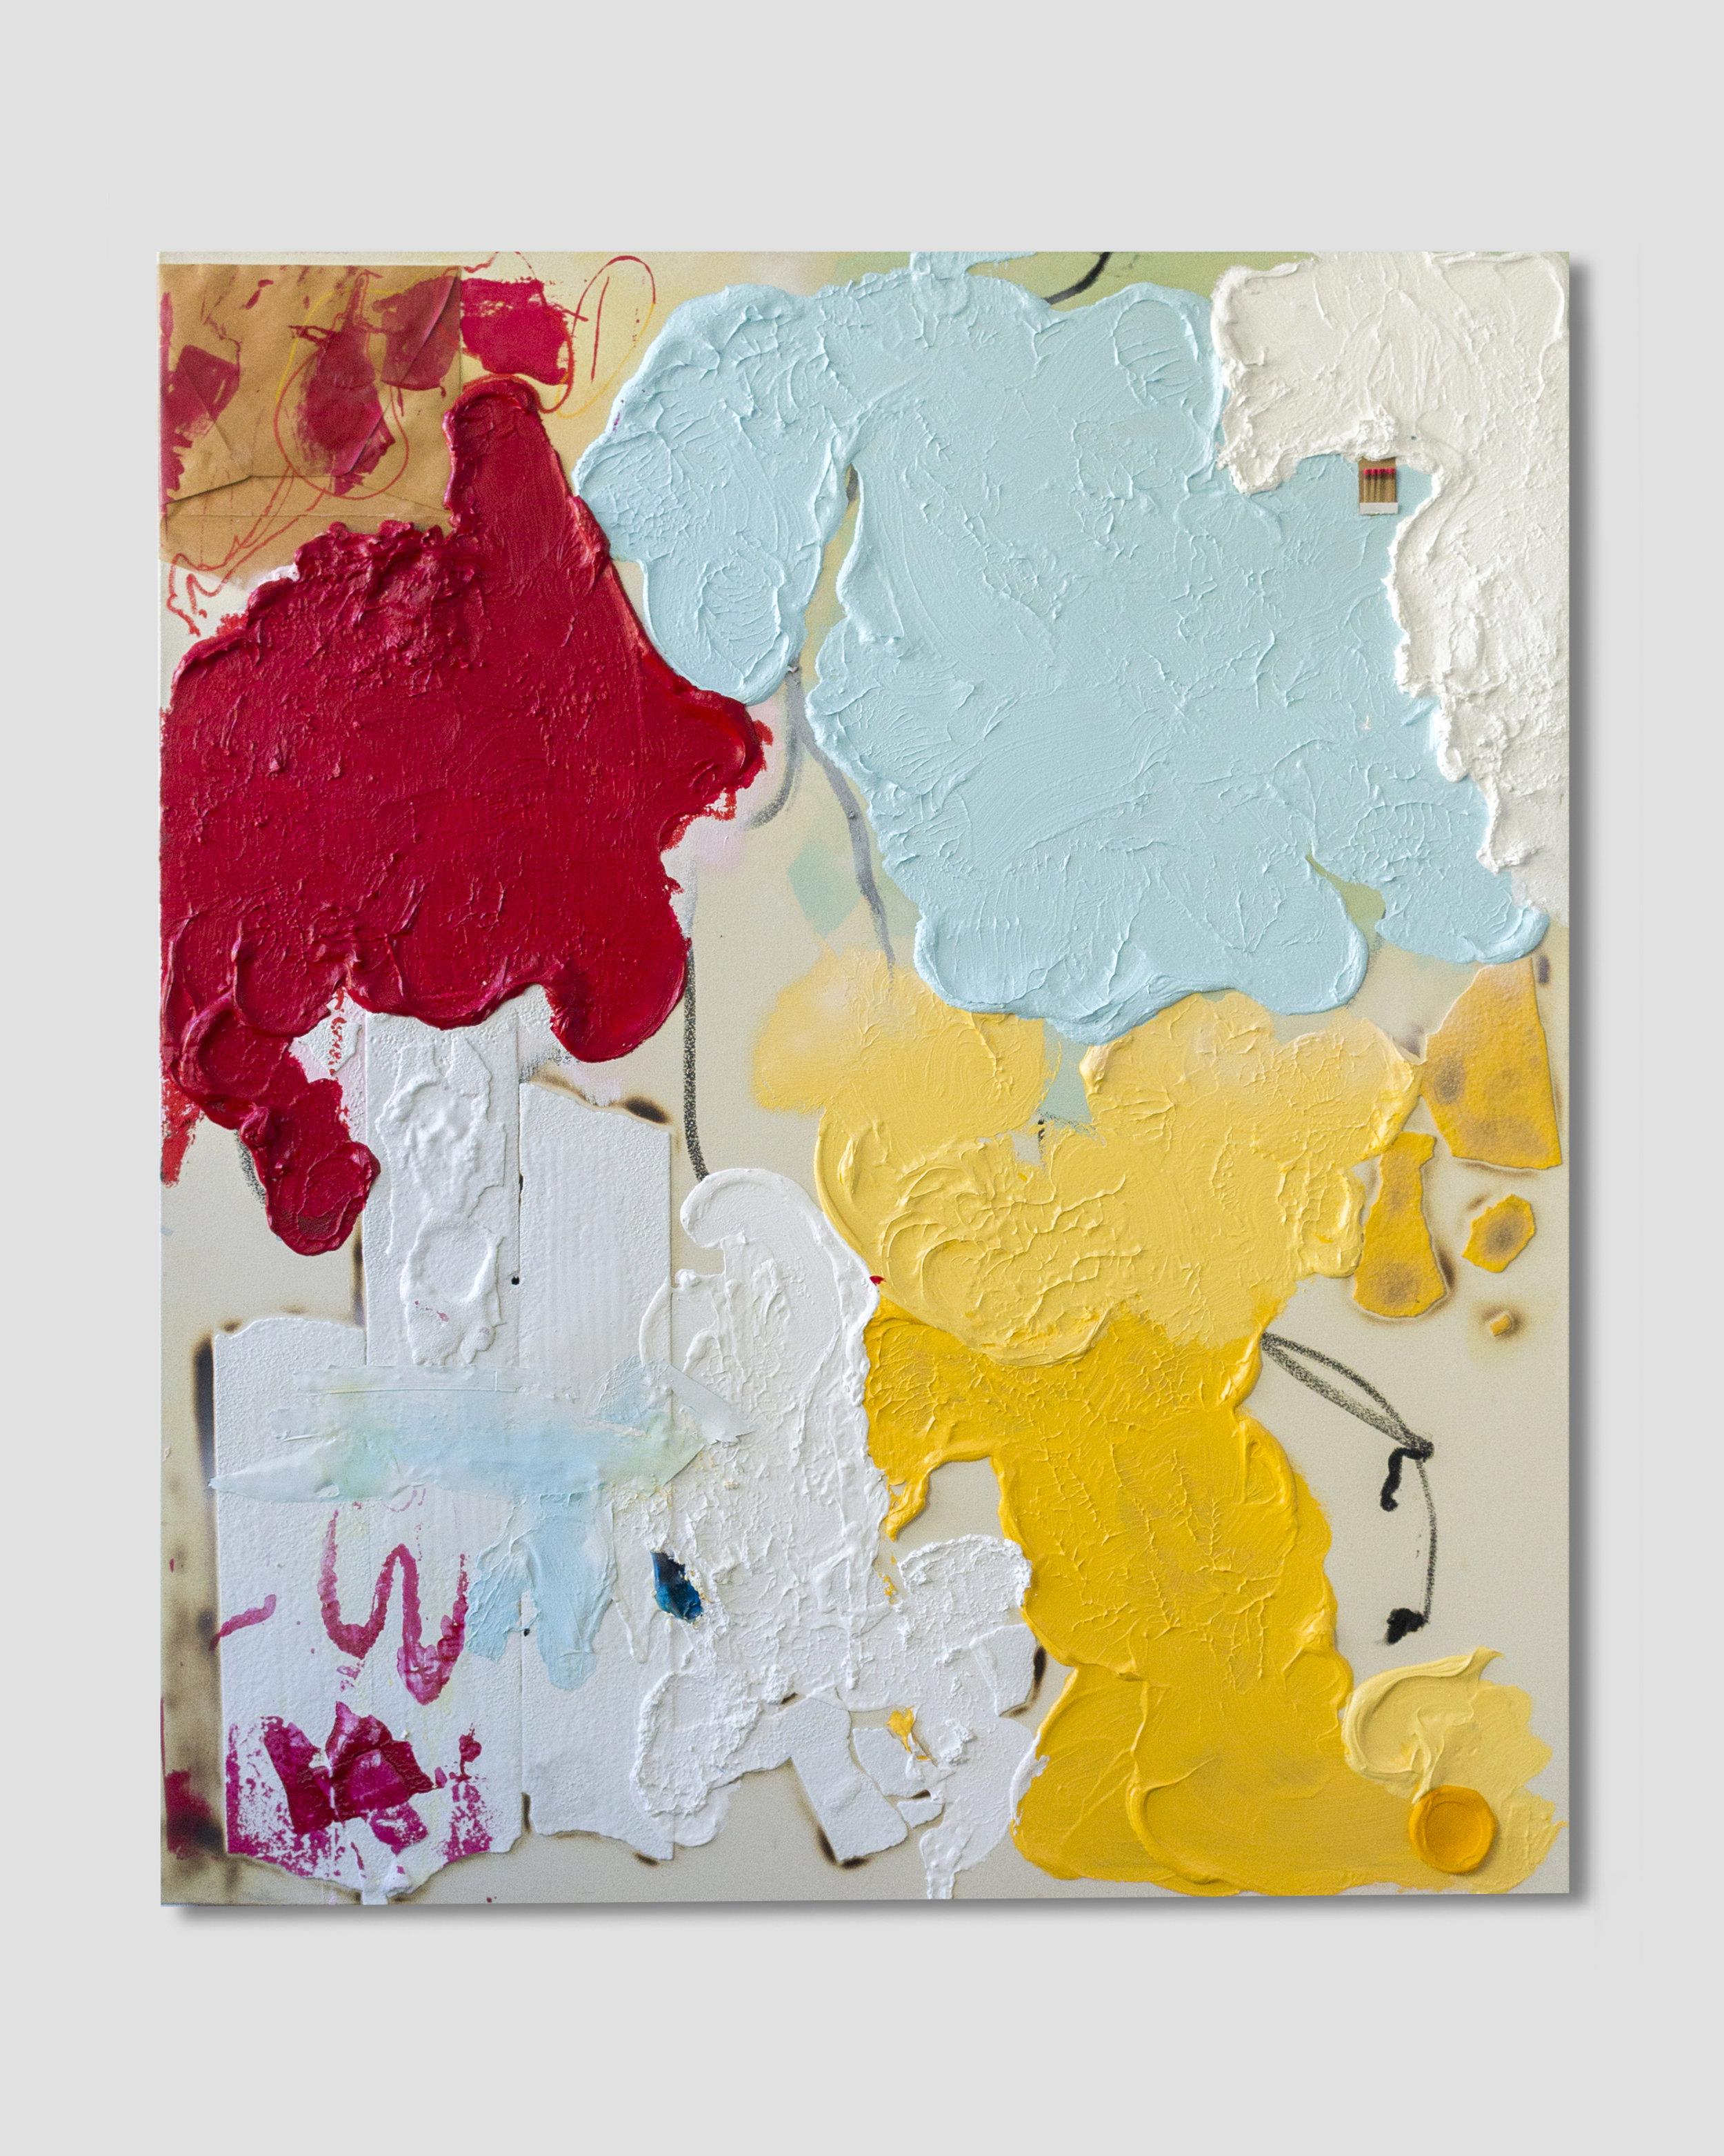 Peinture De La Vie ,  Oil, acrylic, collaged envelope and thermoplastic on canvas  56.3 in x 66.1 in, (143 cm x 168 cm)